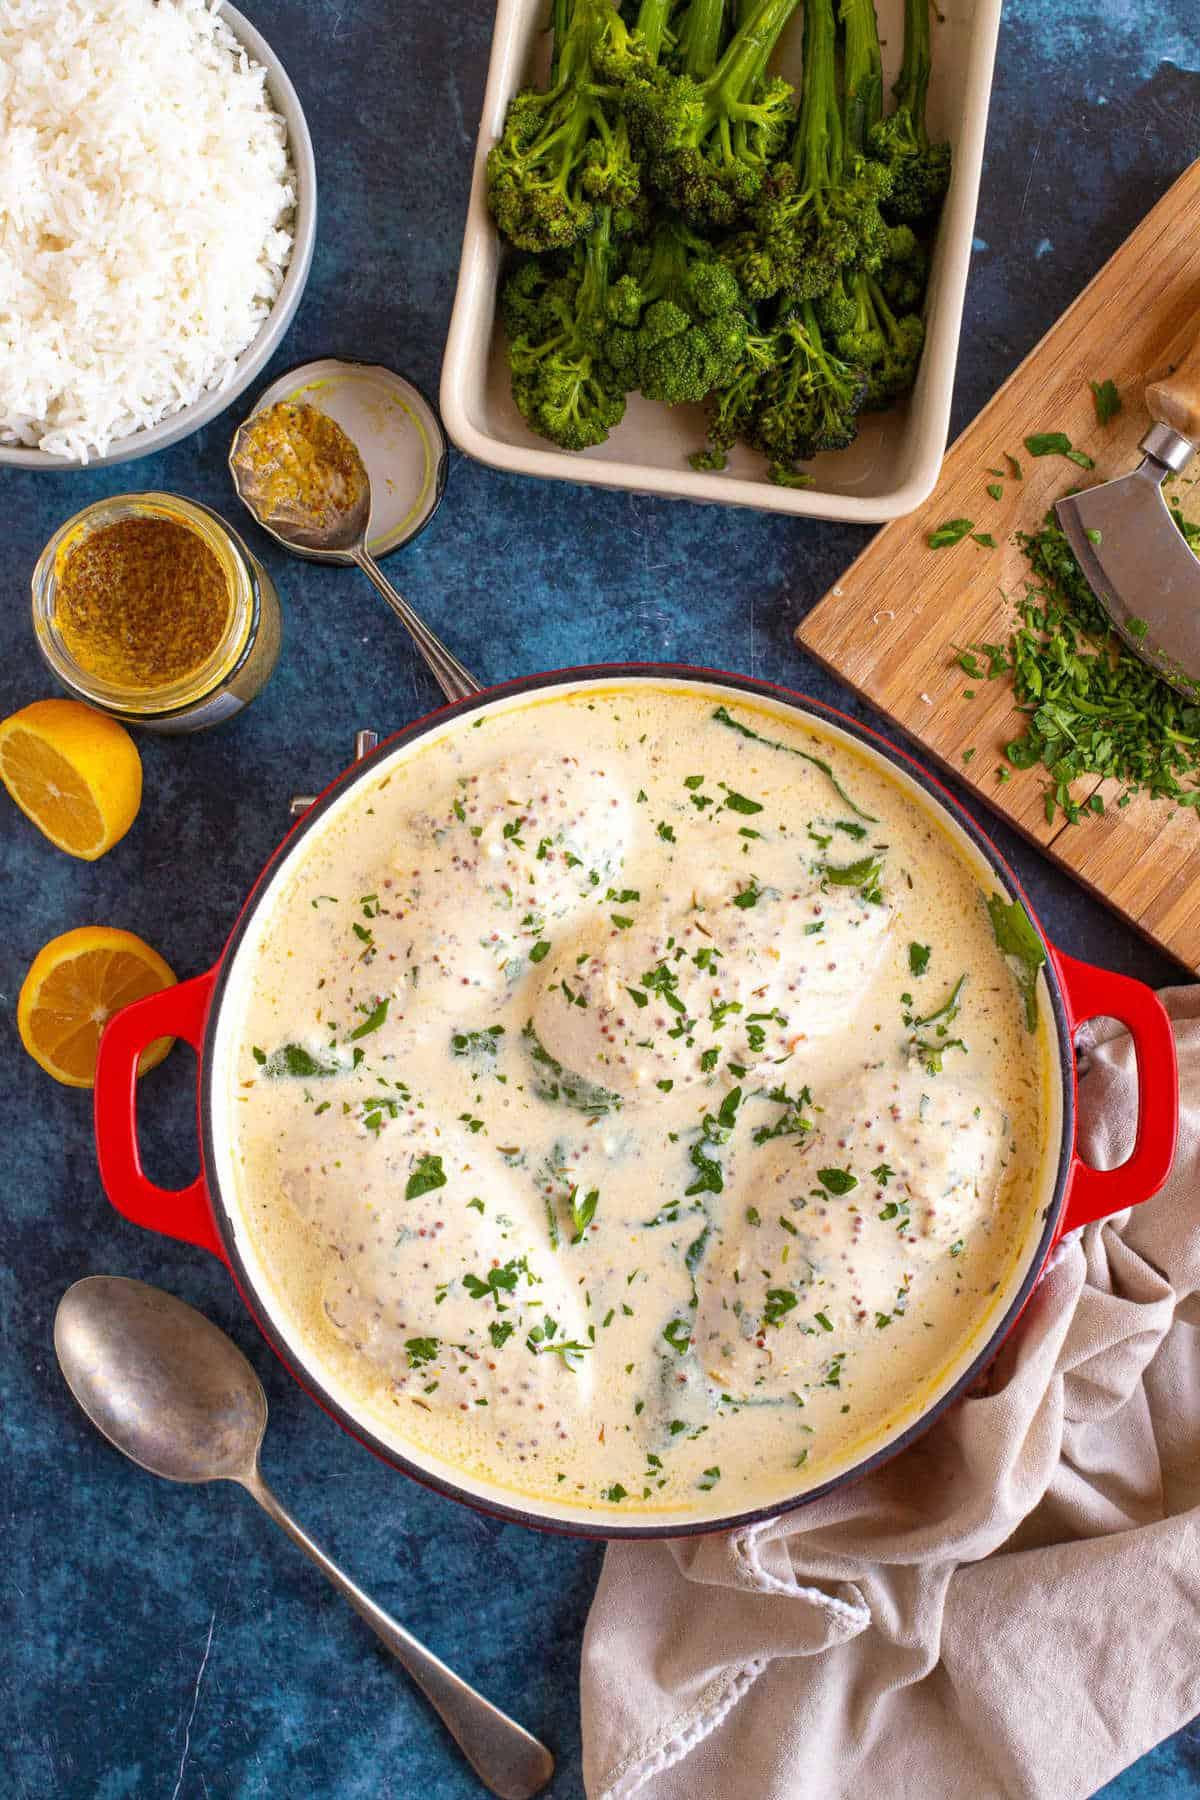 Crème fraiche chicken in a red pan.